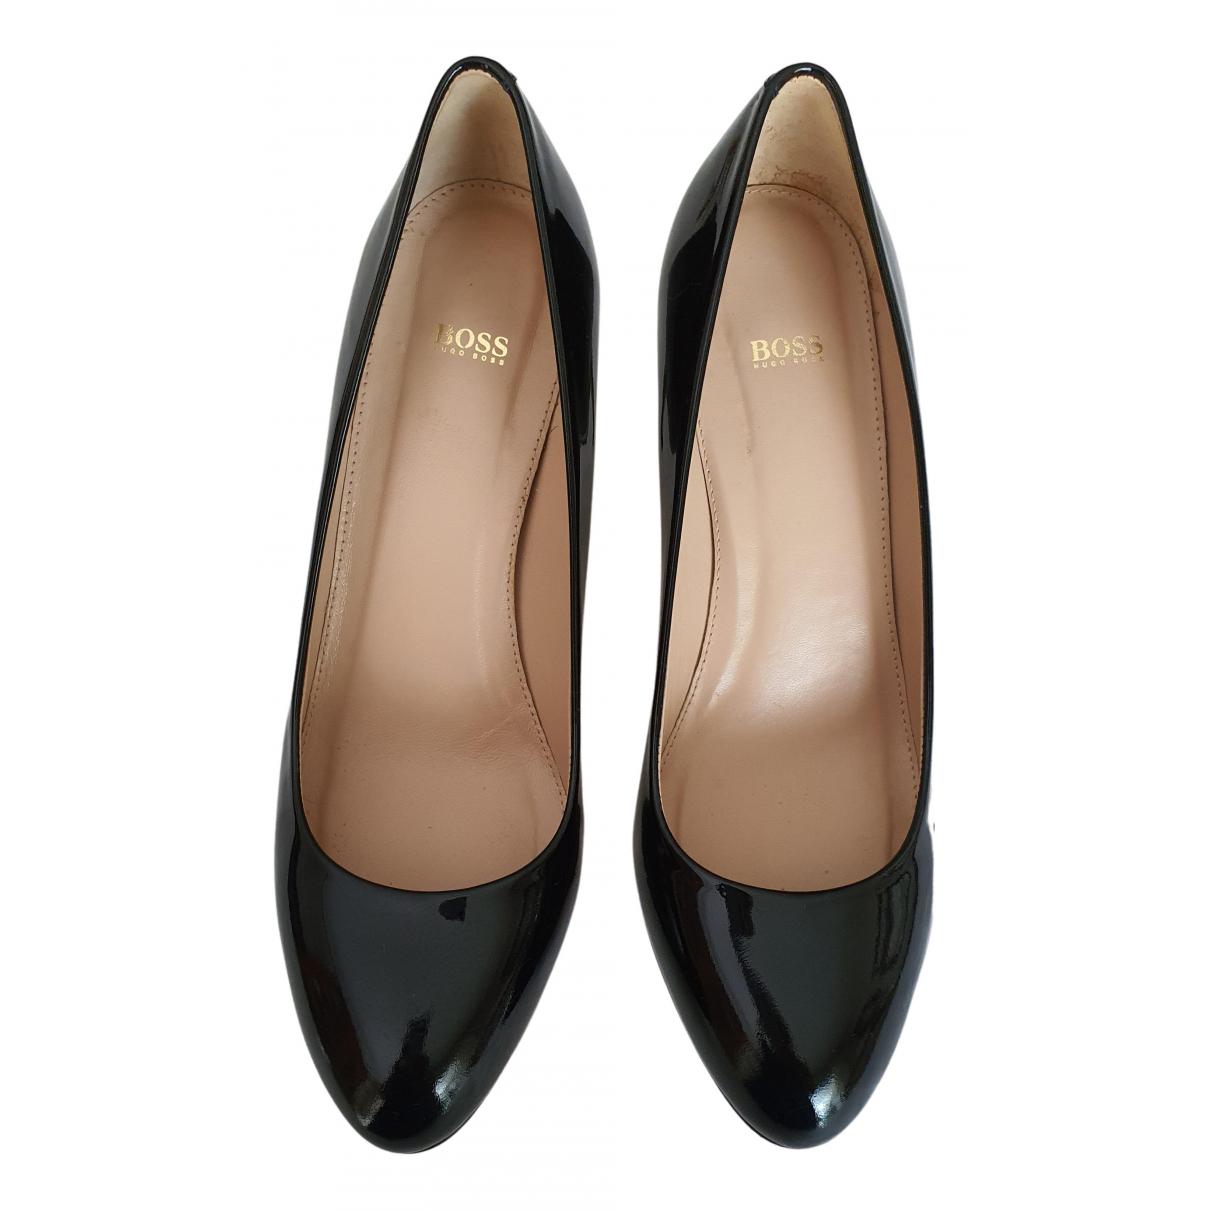 Boss N Black Patent leather Heels for Women 40 EU